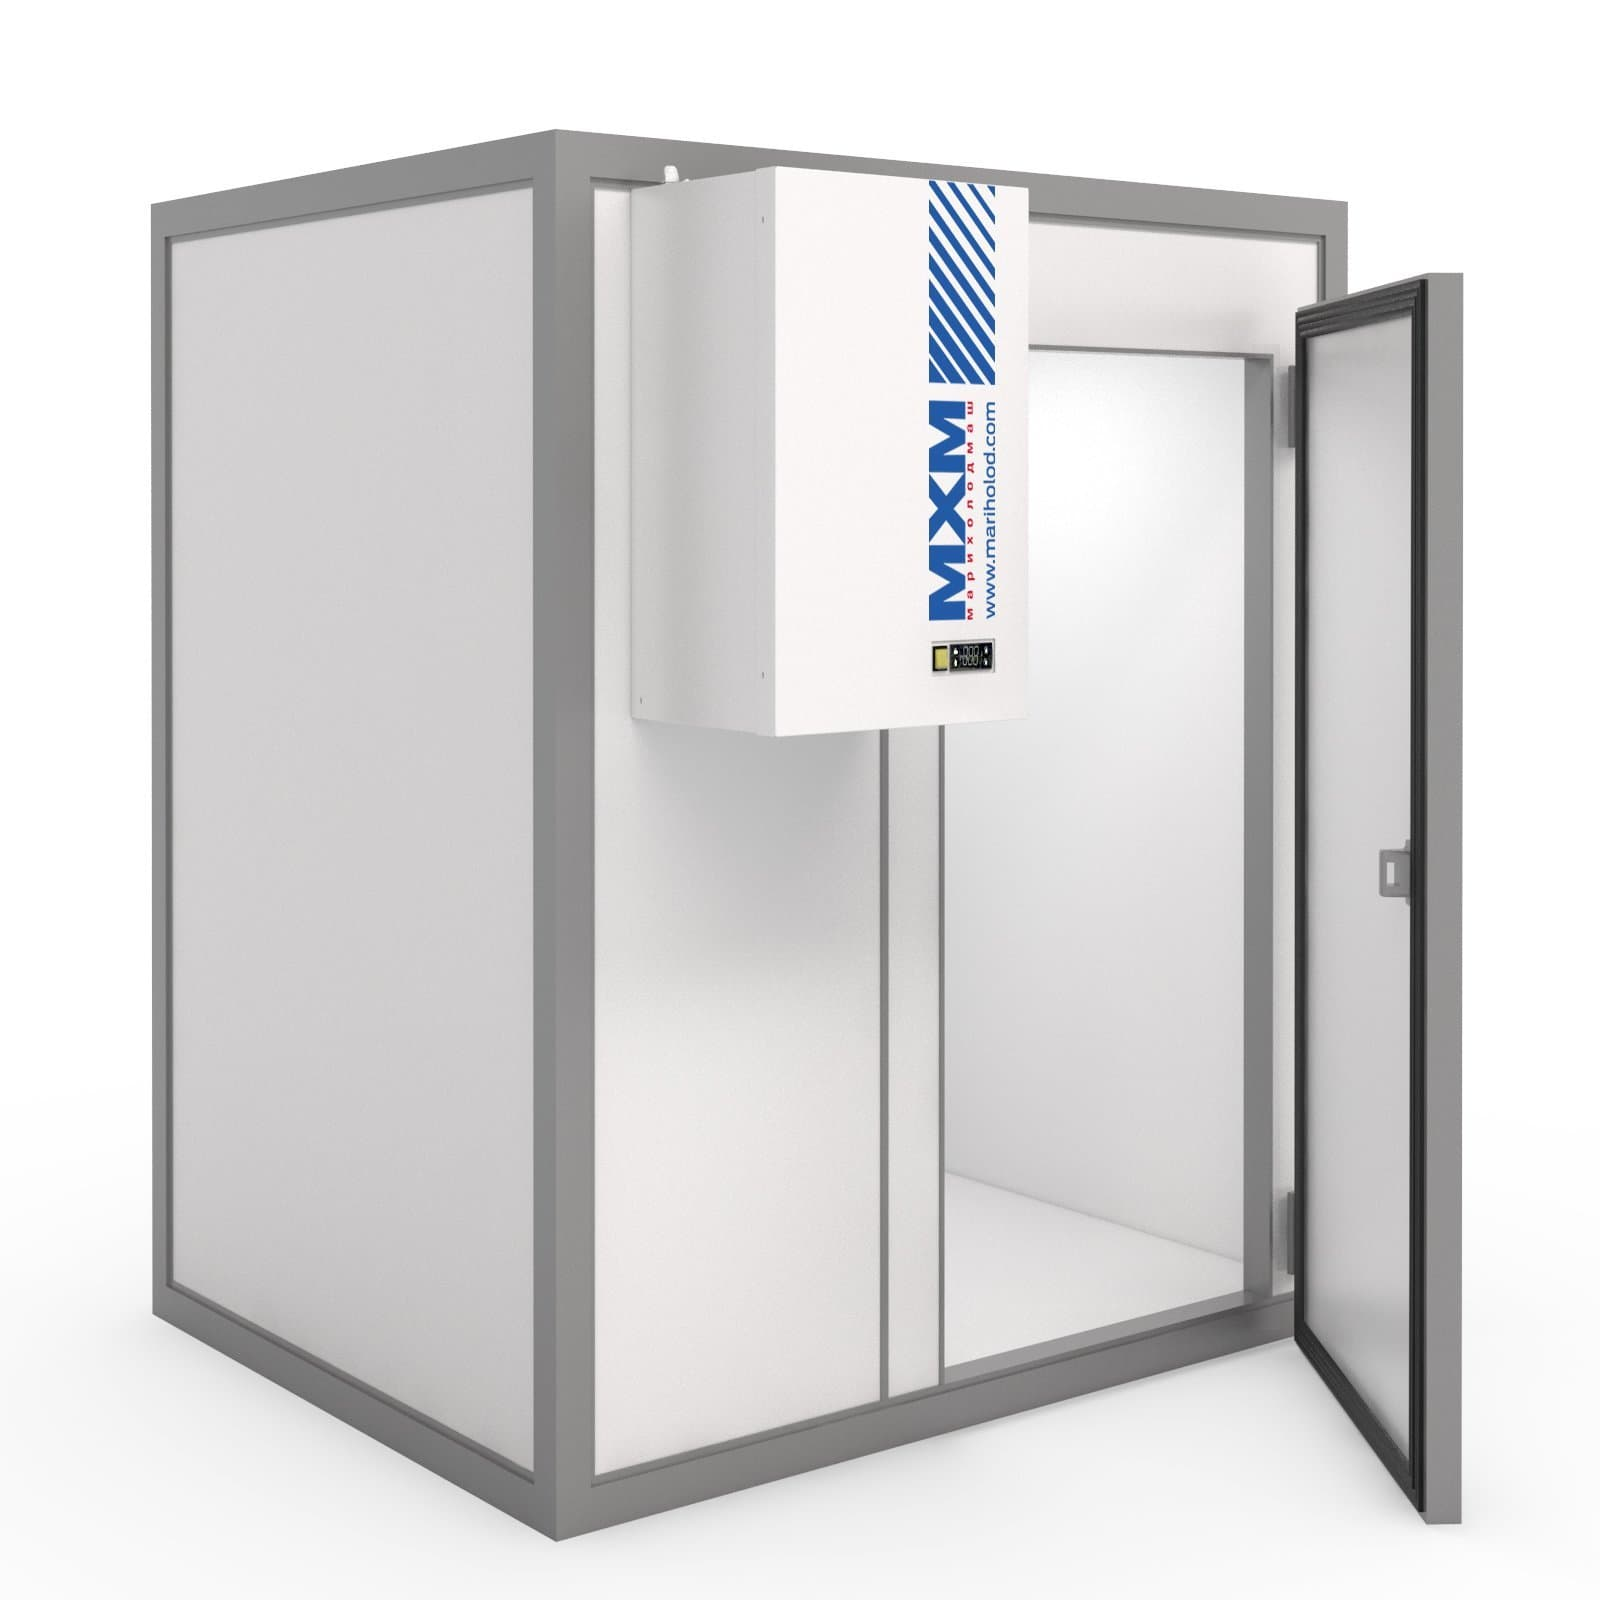 Камера холодильная МХМ КХН-5,53 1360×1960×2720